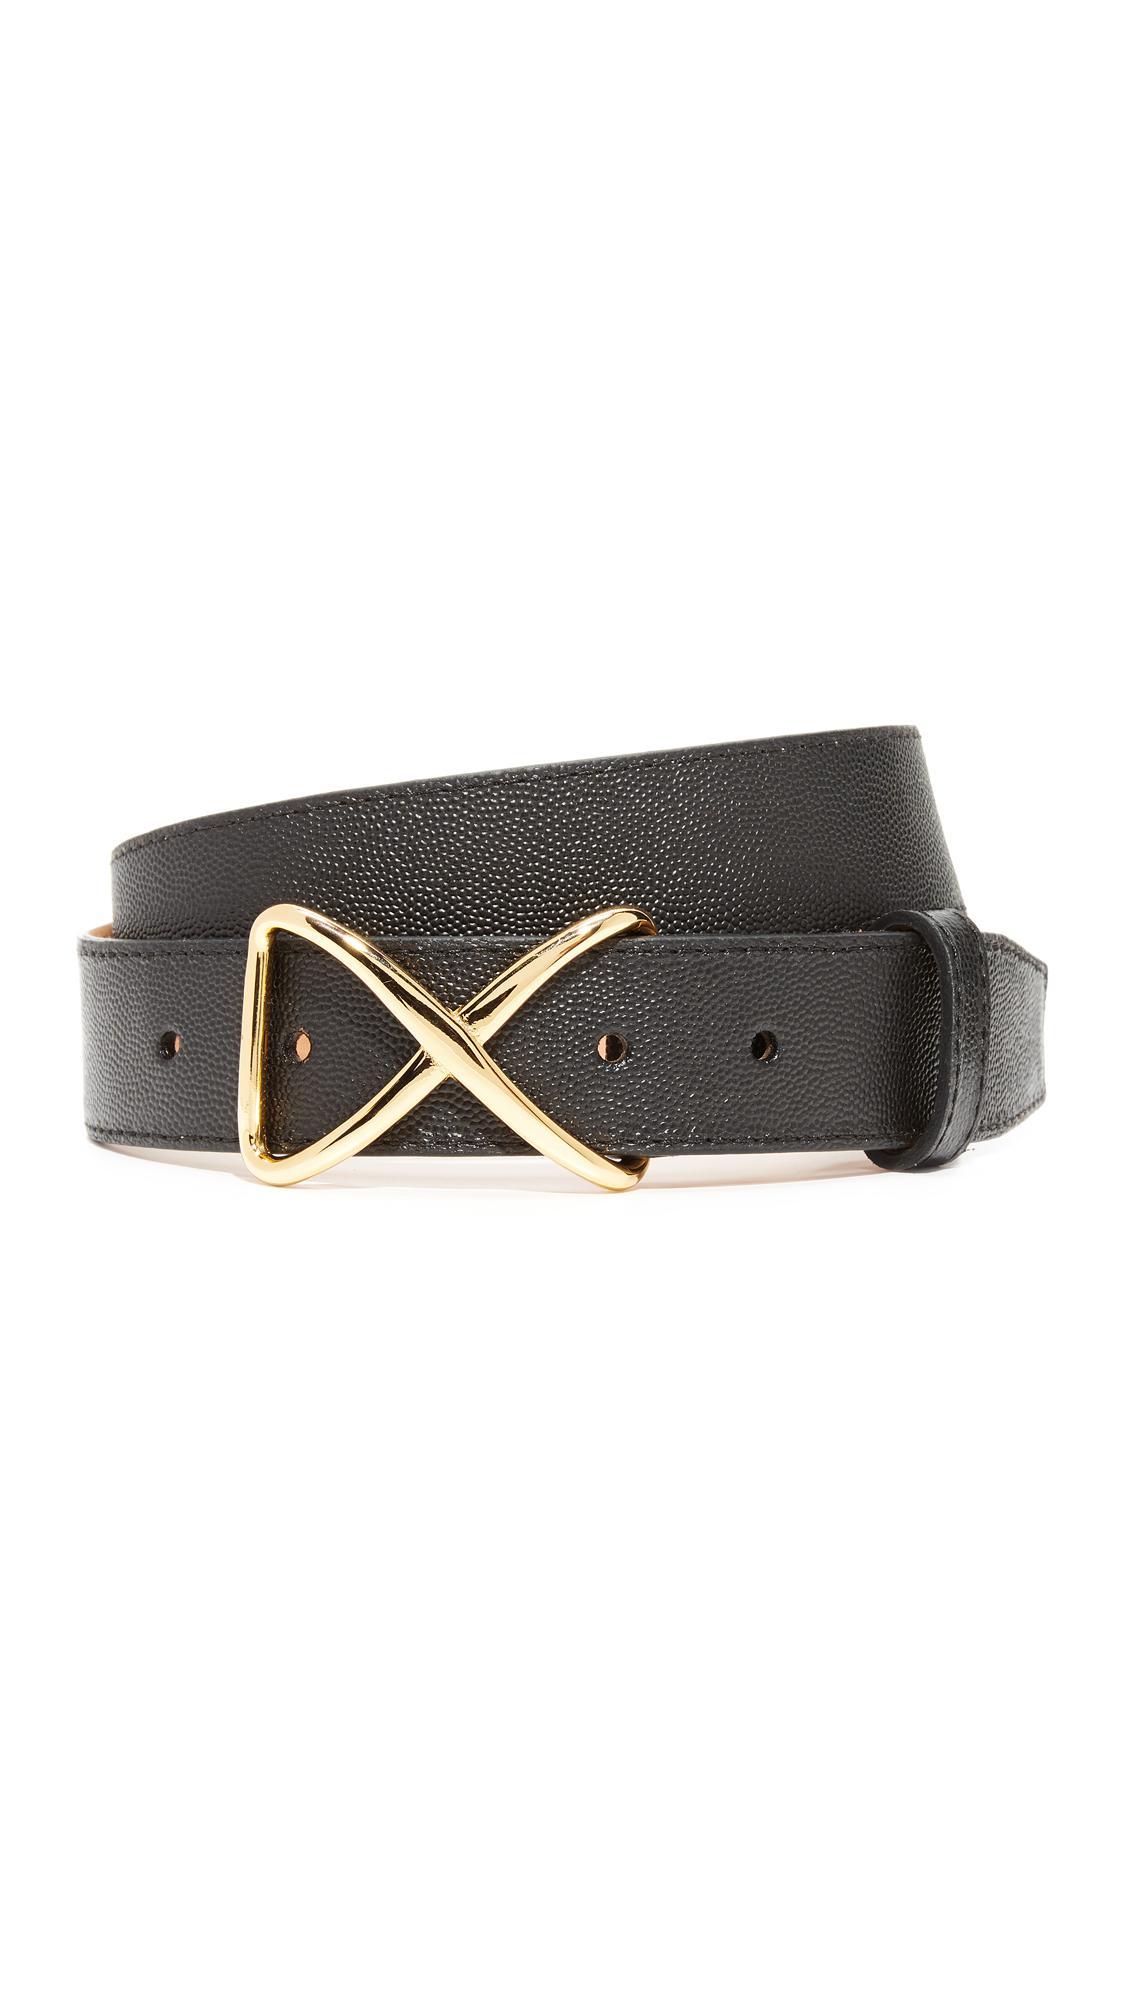 Small Leather Goods - Belts Compagnia Italiana i7rvhqj0